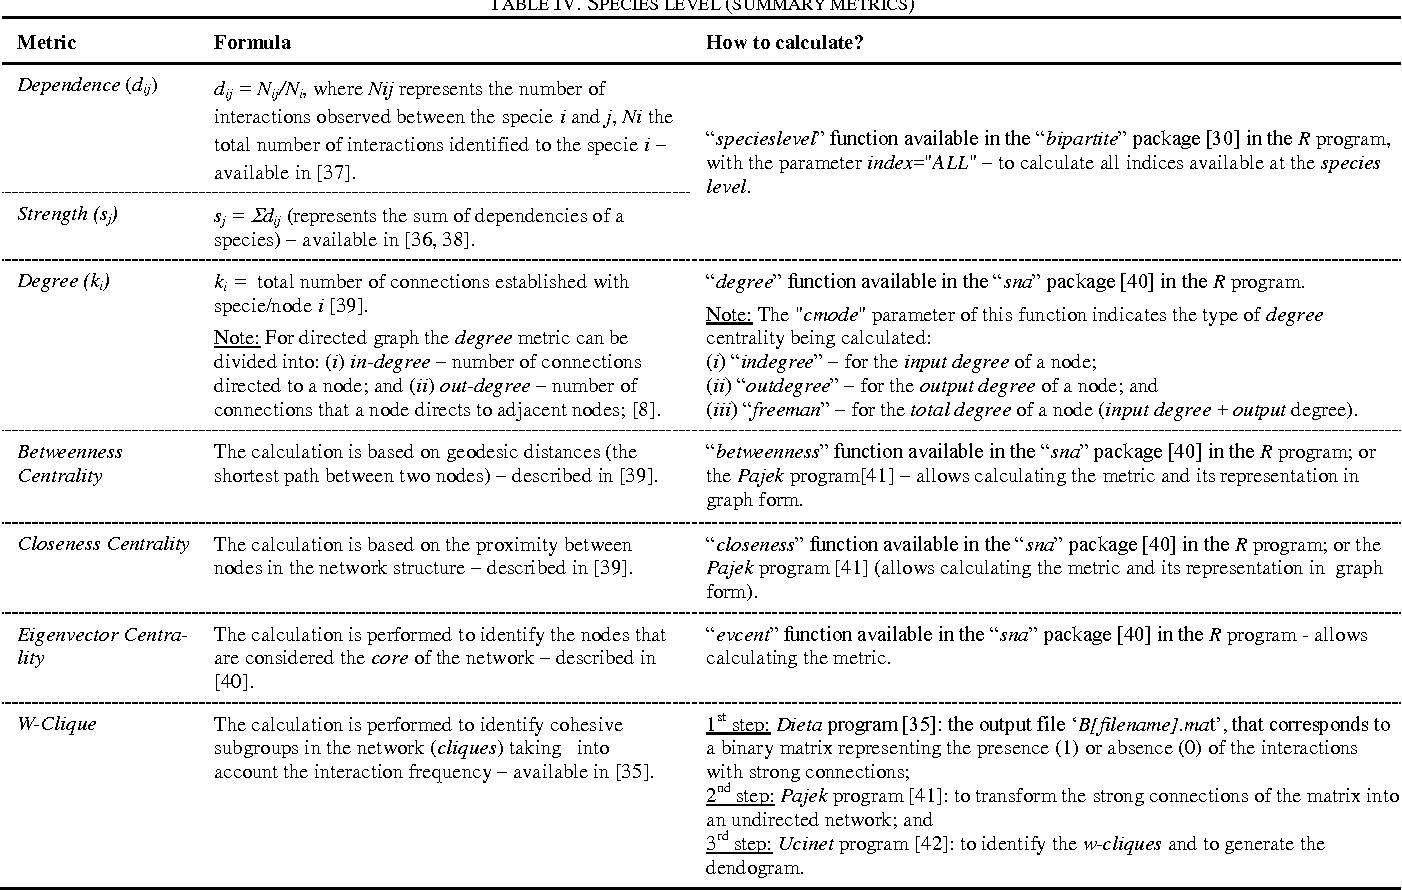 Table IV from A methodology for applying social network